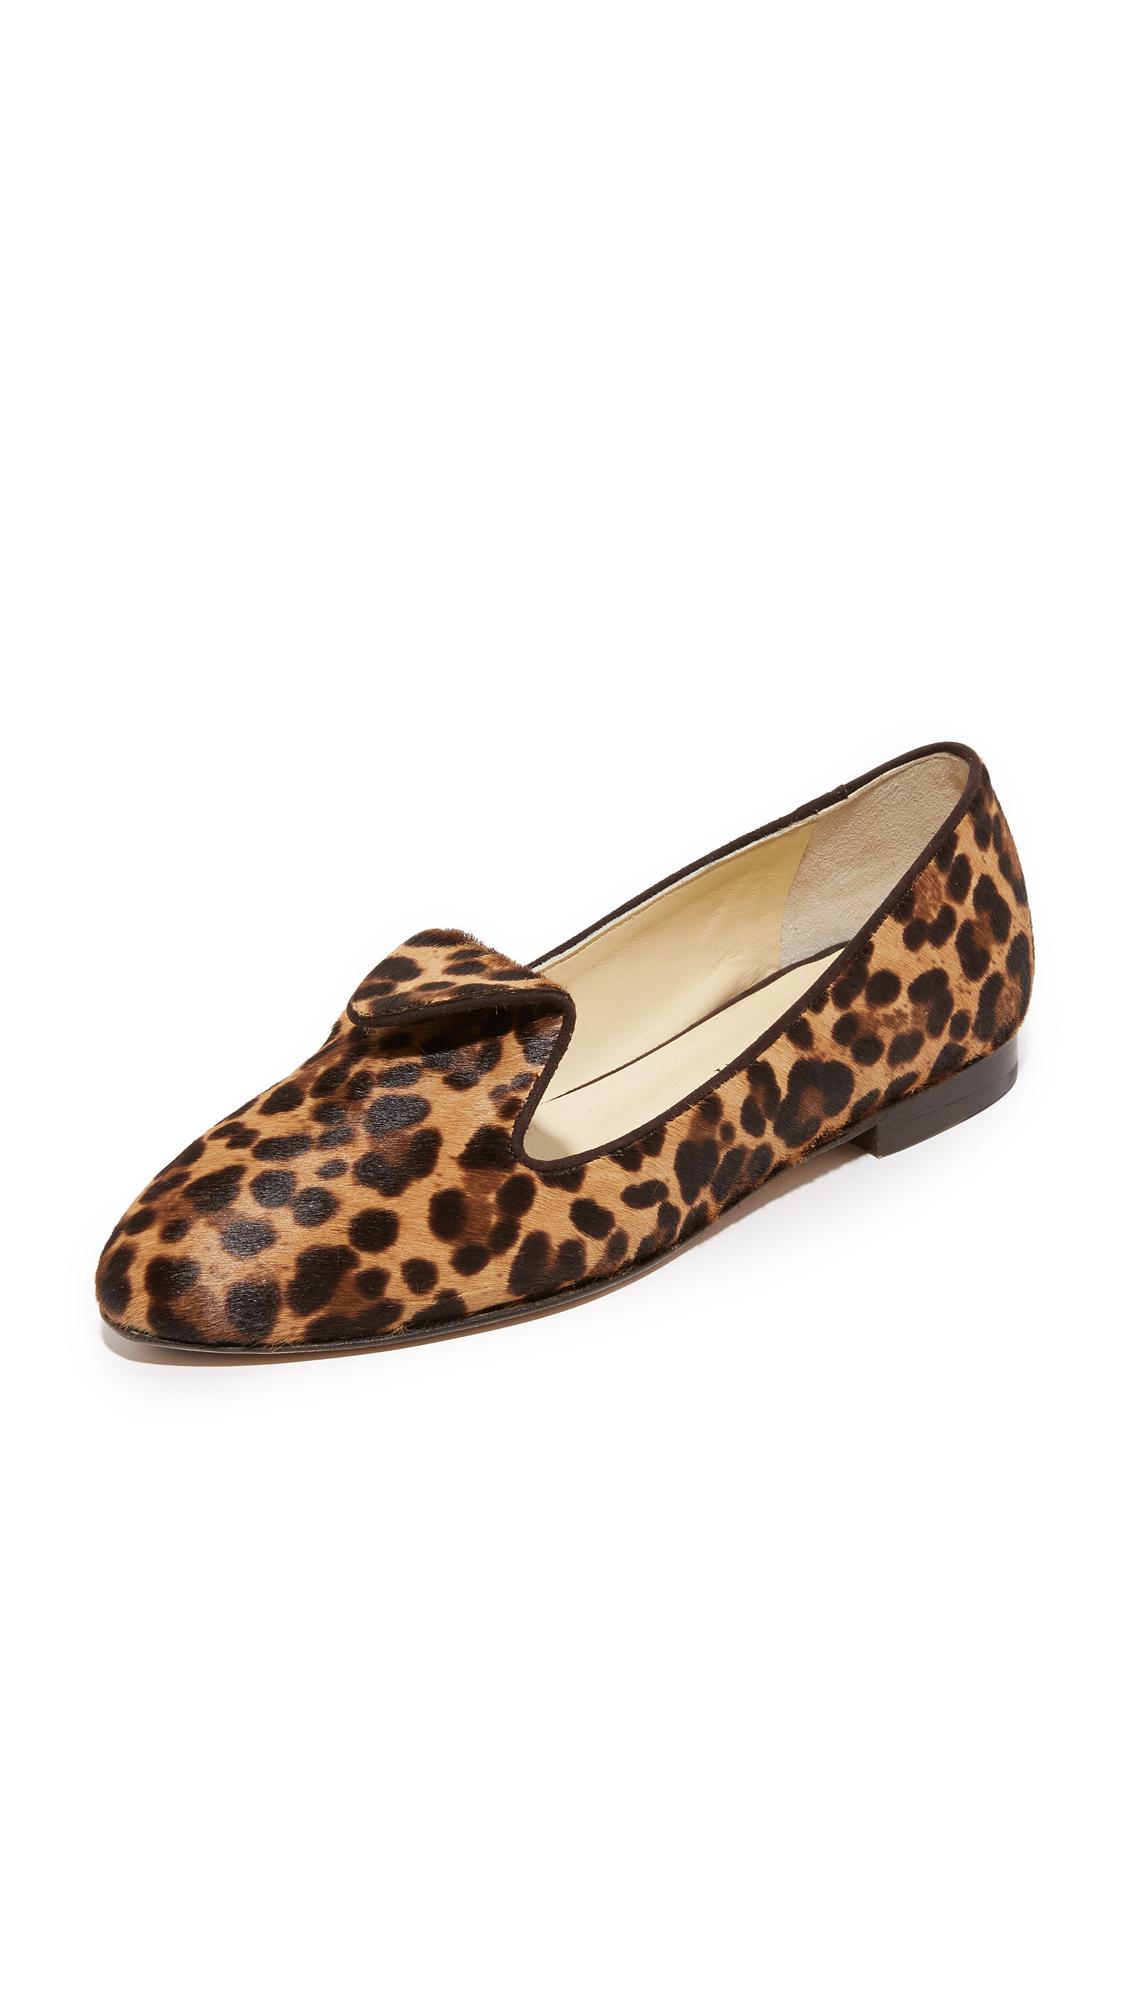 sarah flint female sarah flint andrea flats chocolate leopard